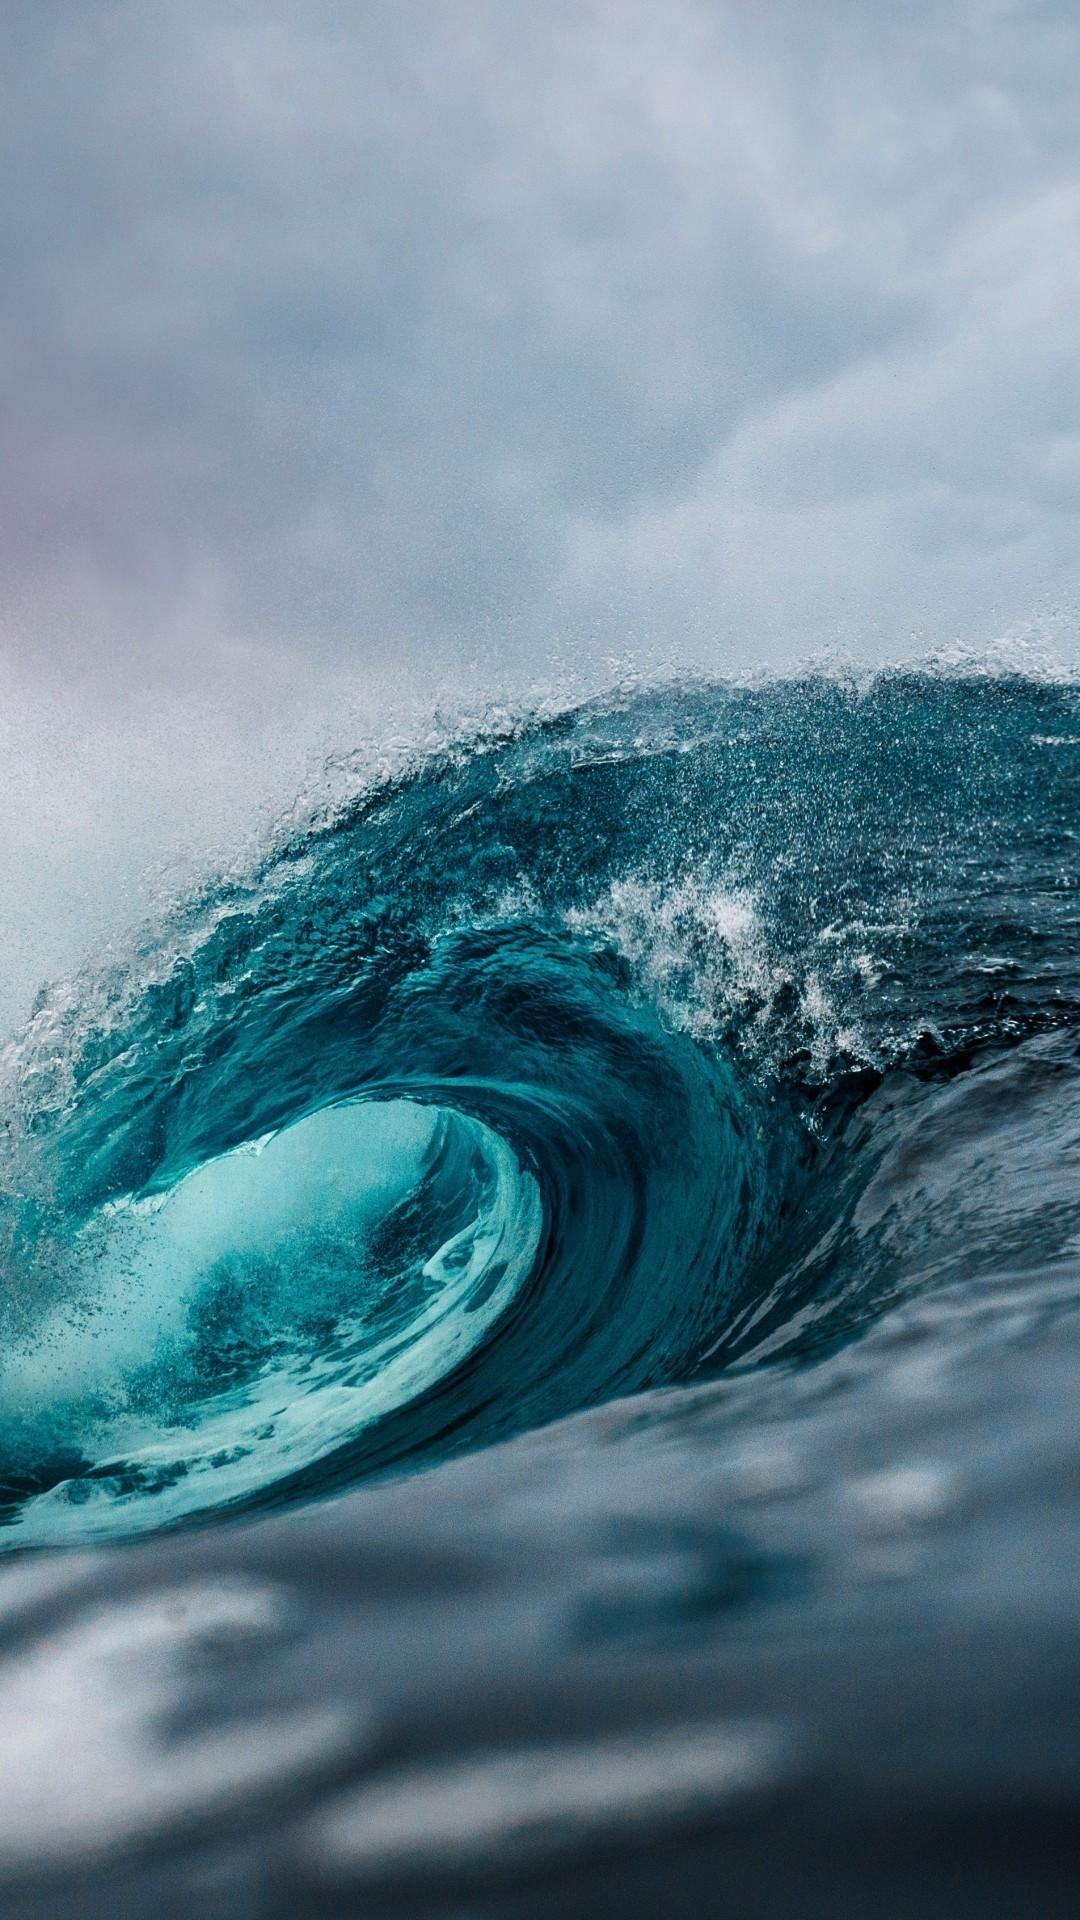 Ocean Waves iphone 7 wallpaper